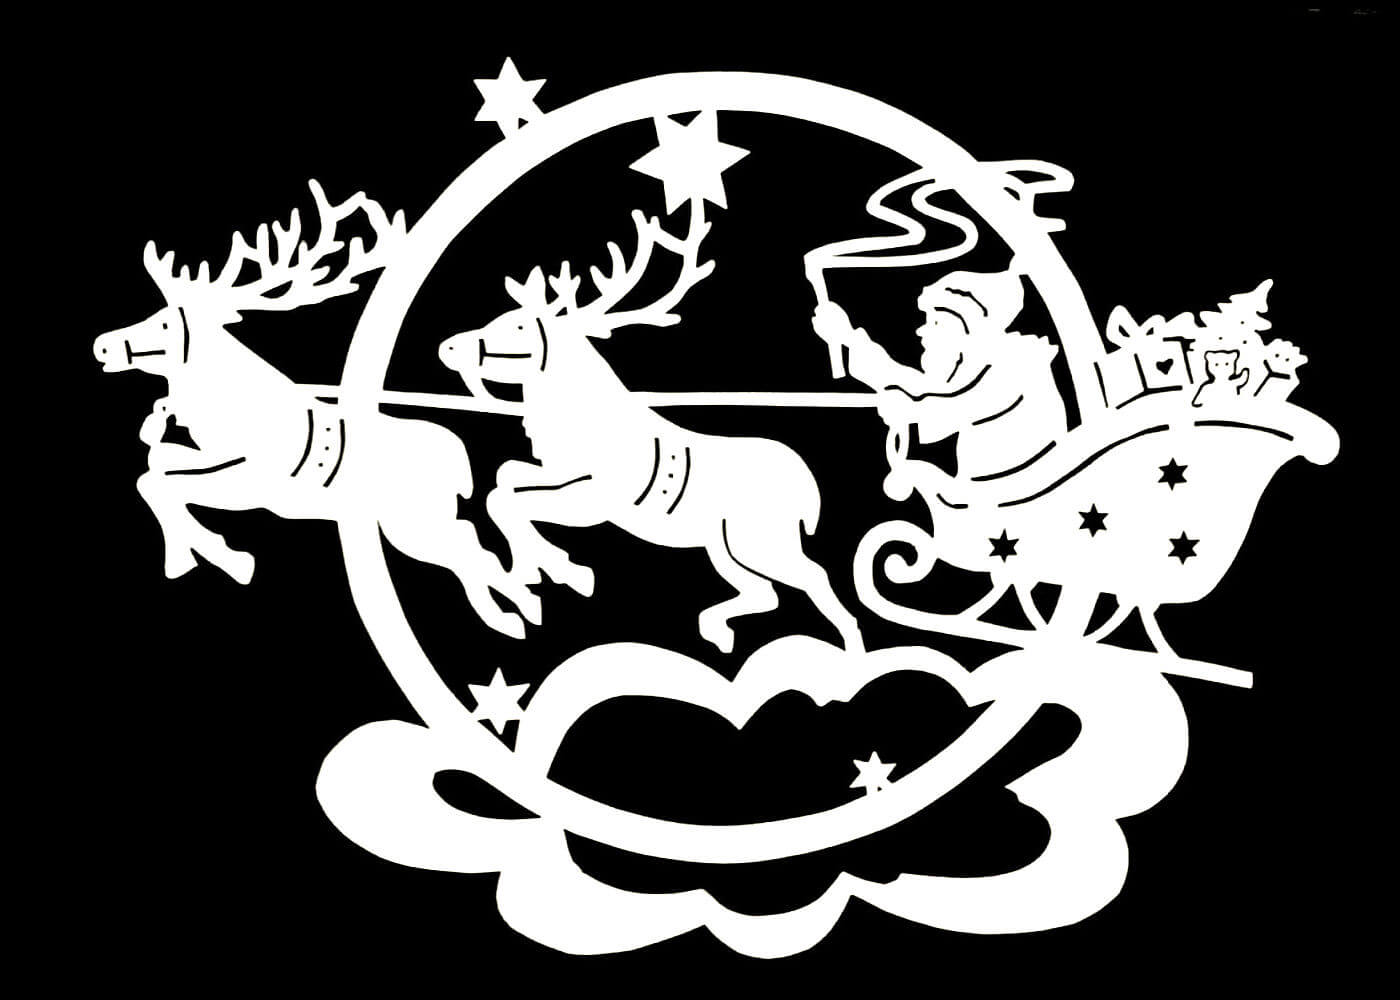 Дед Мороз - трафареты для вырезания на окна фото 3